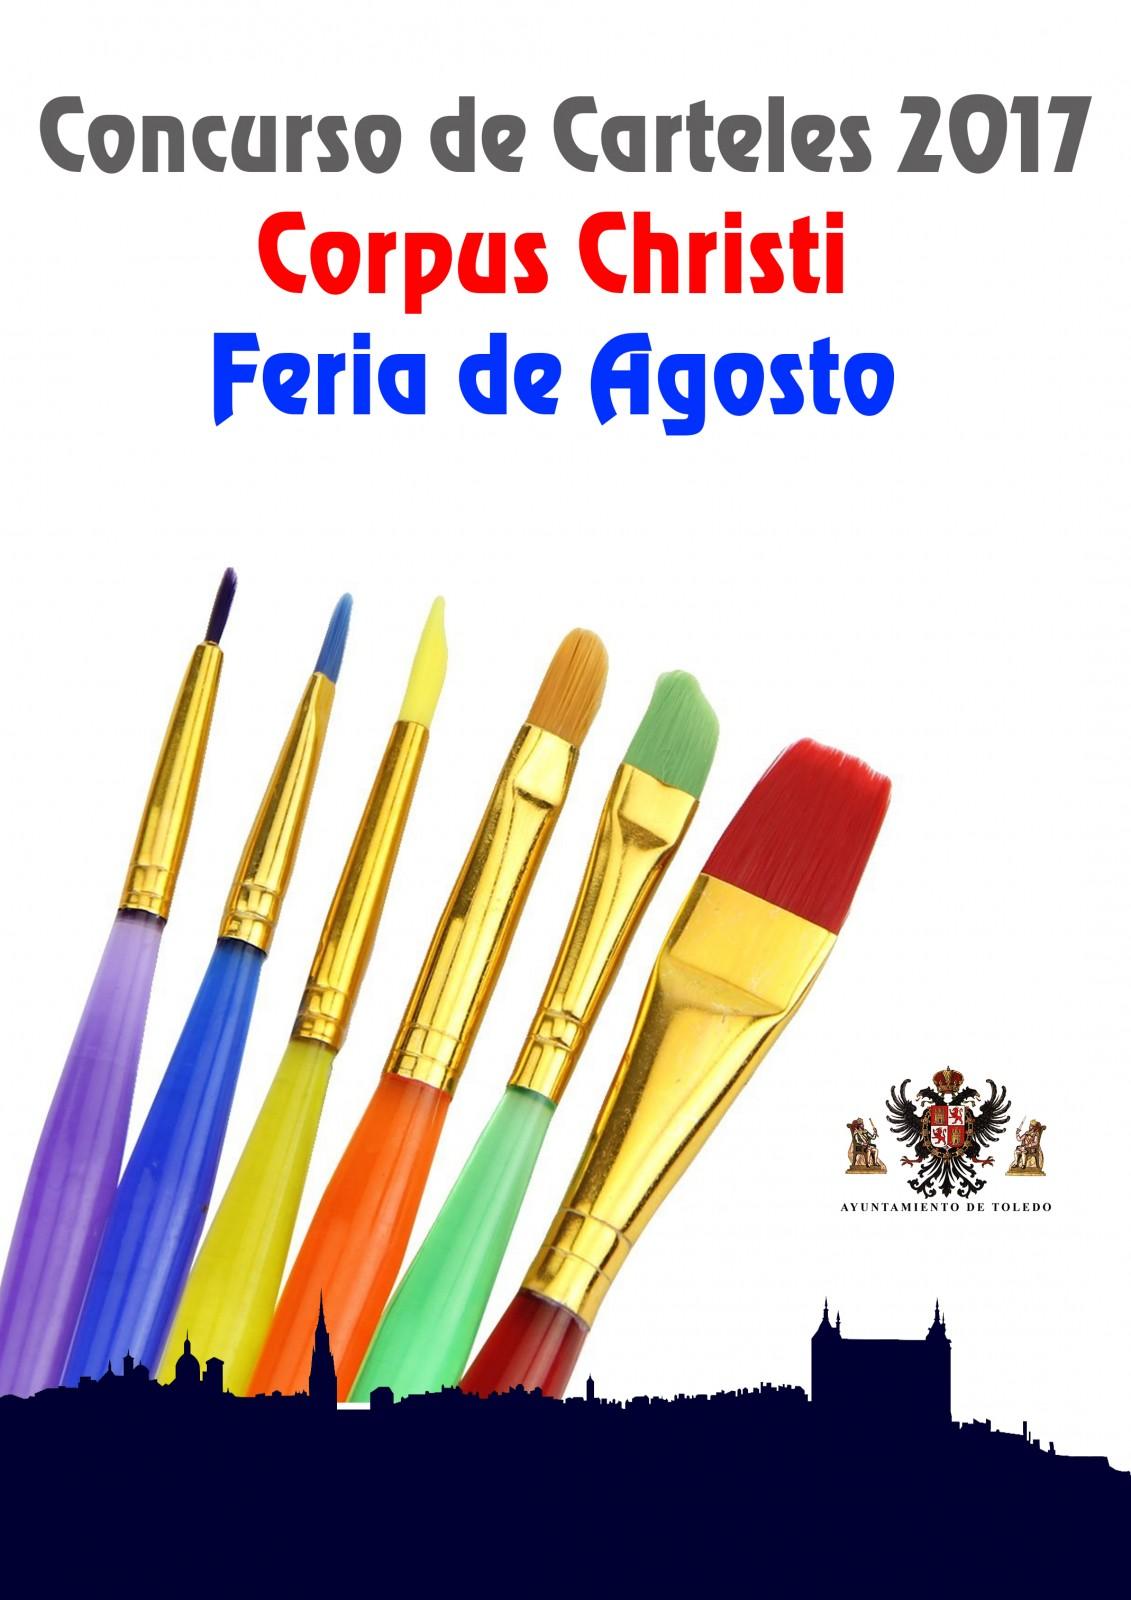 Convocatoria Concurso De Carteles Corpus Christi Y Feria De Agosto